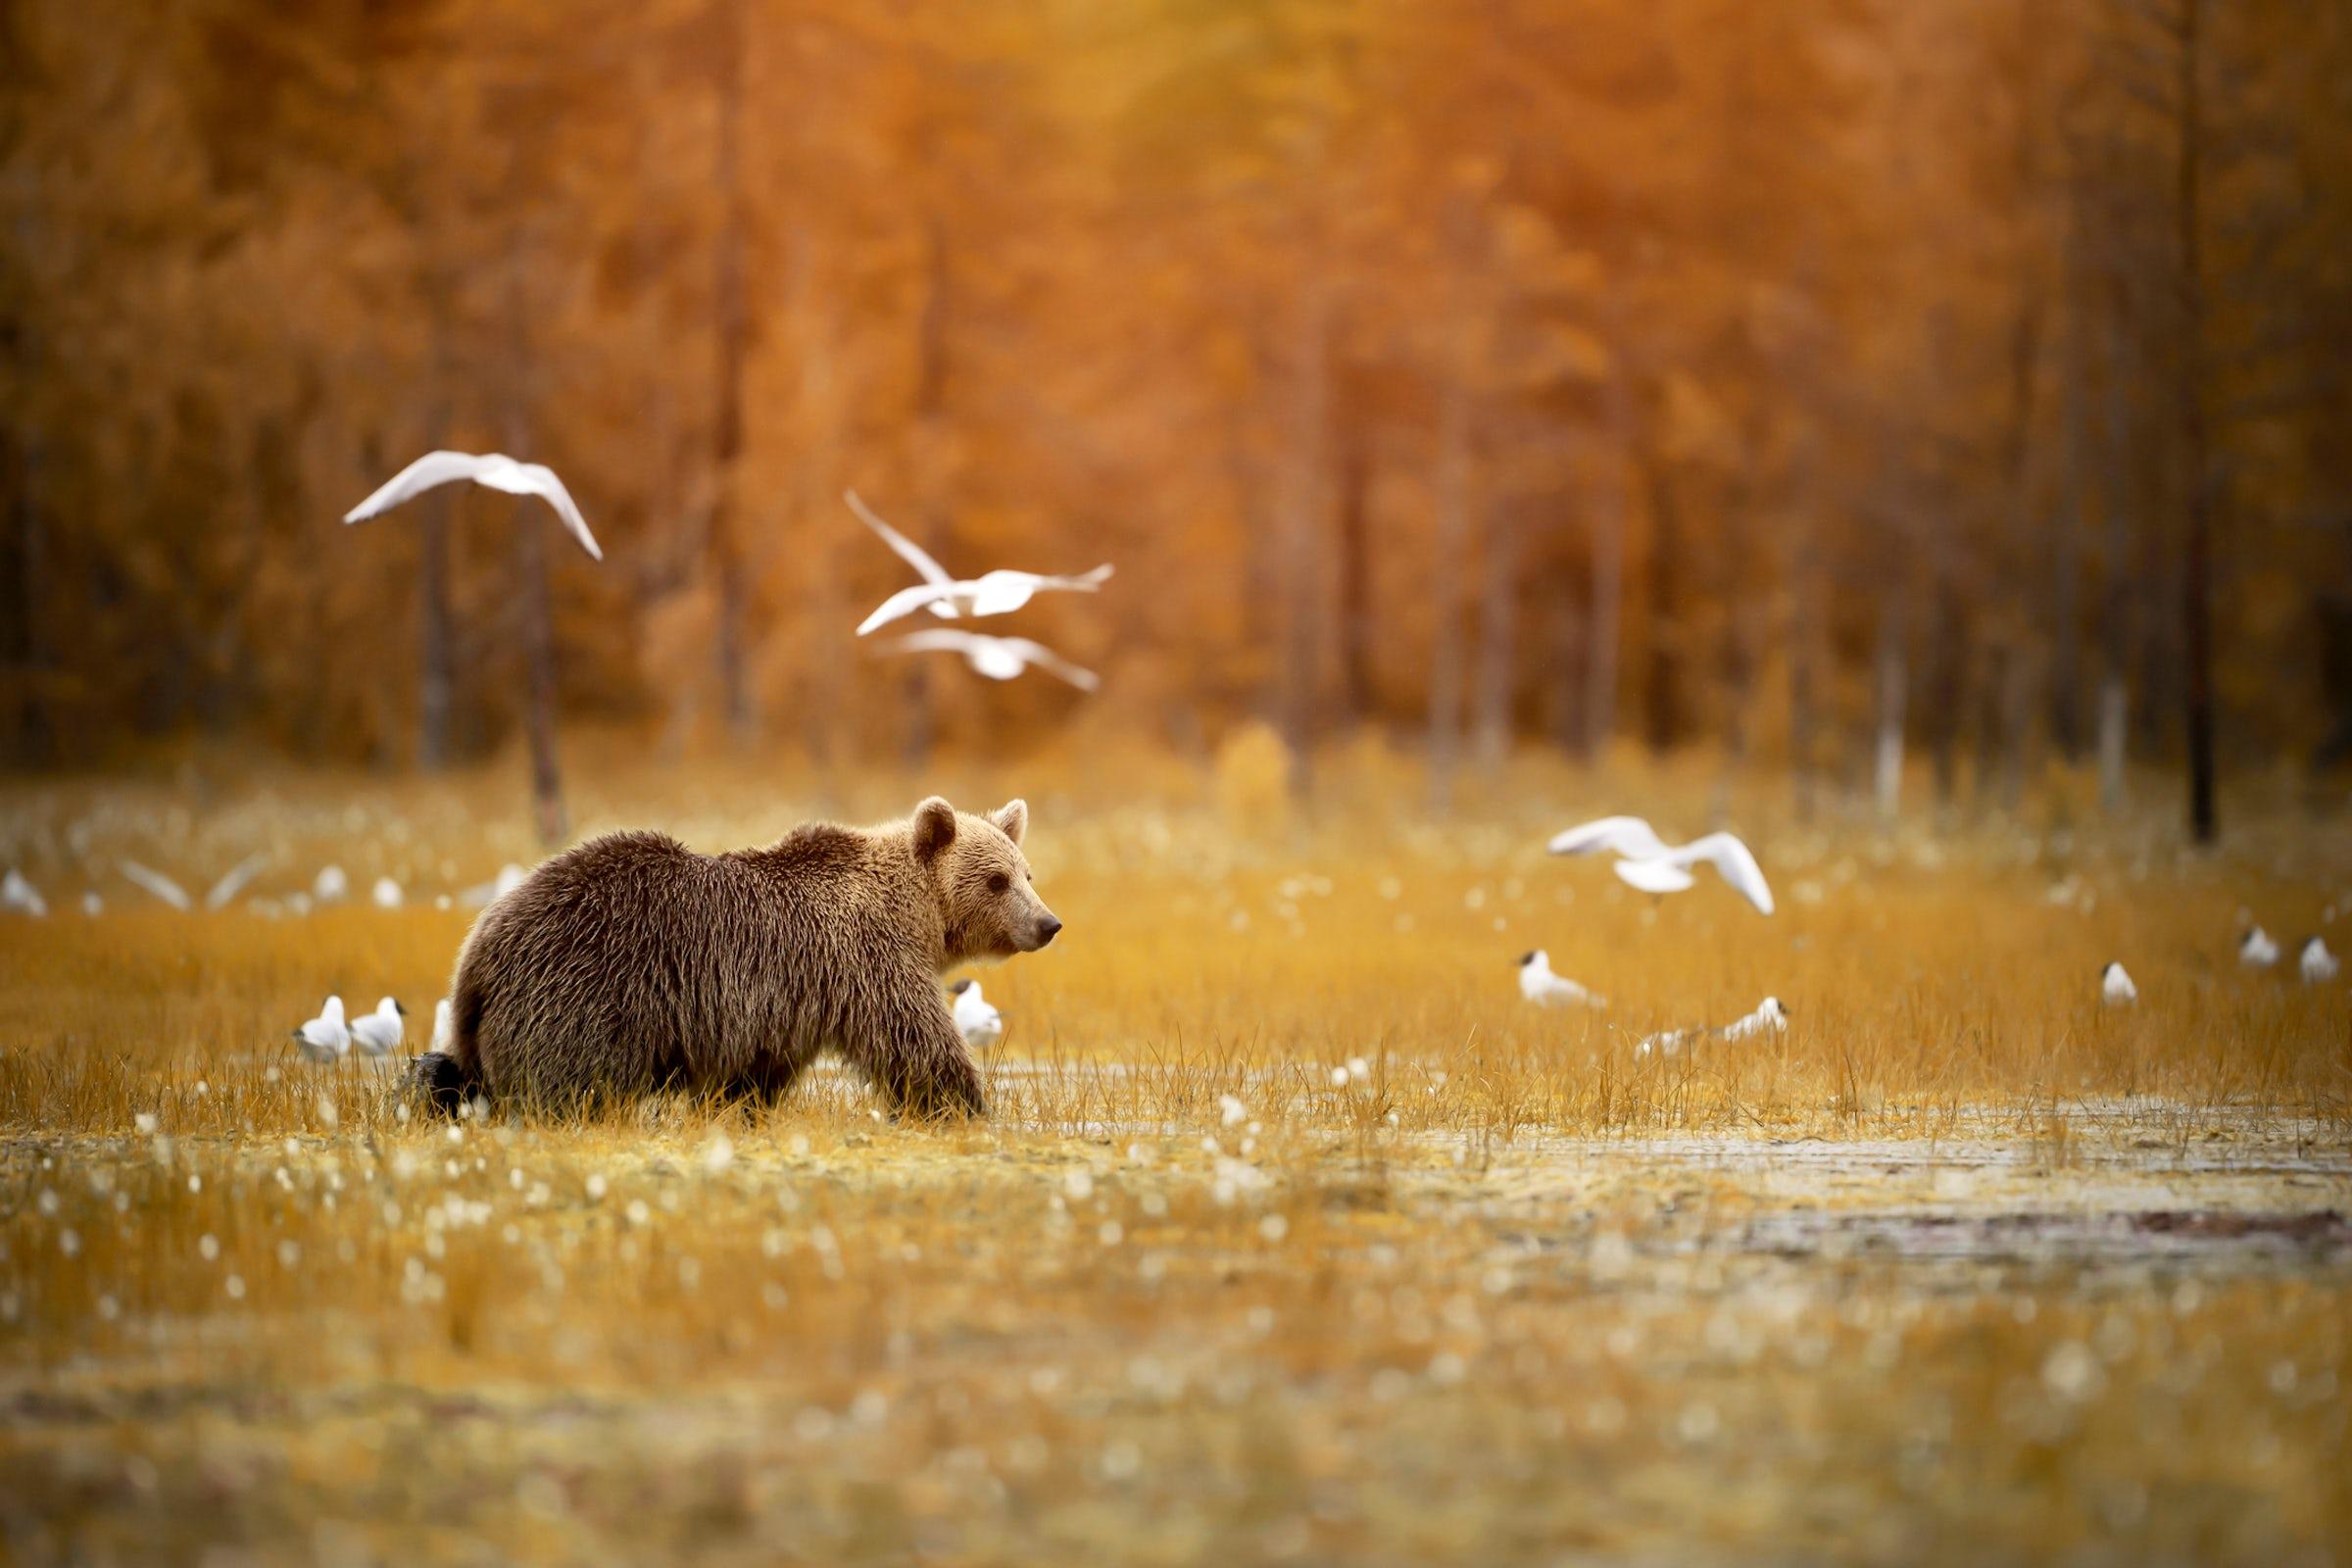 A wildlife Experience